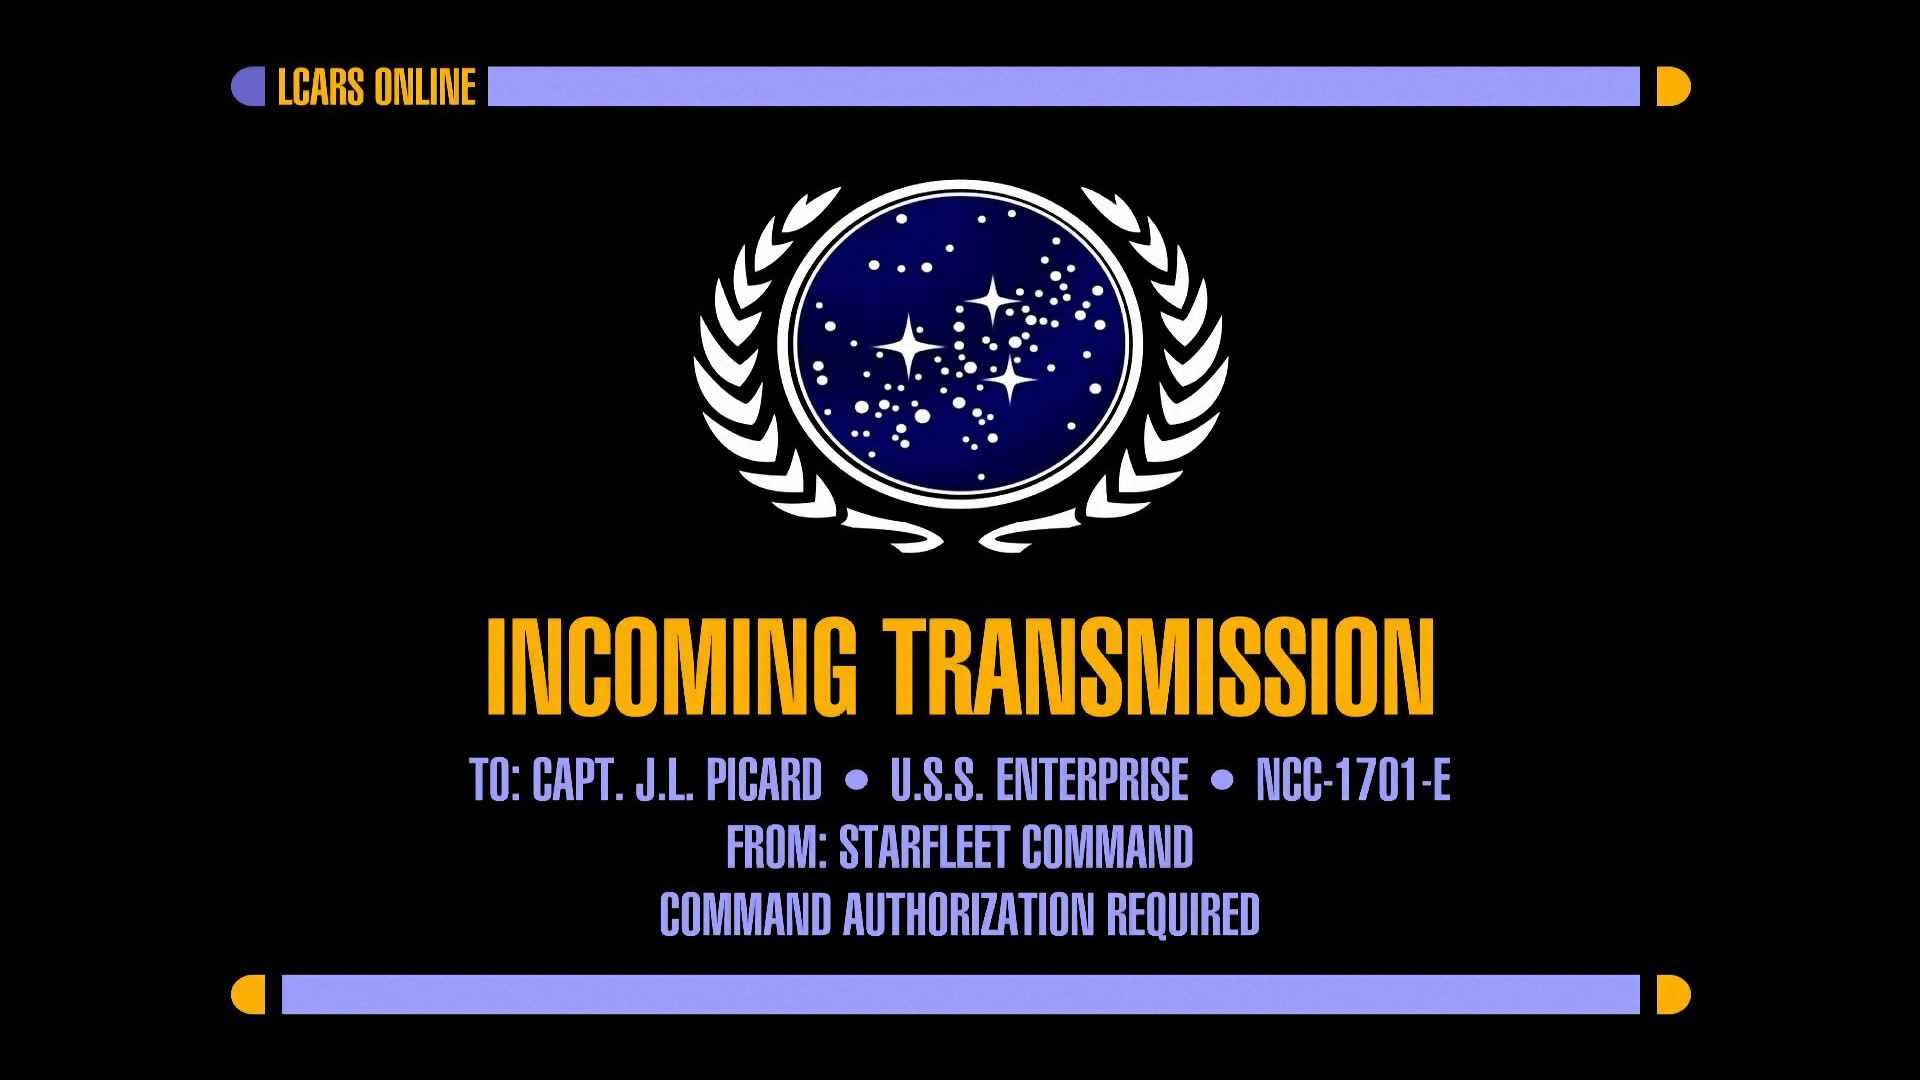 Star Trek Incoming Transmission Screen HD Wallpaper